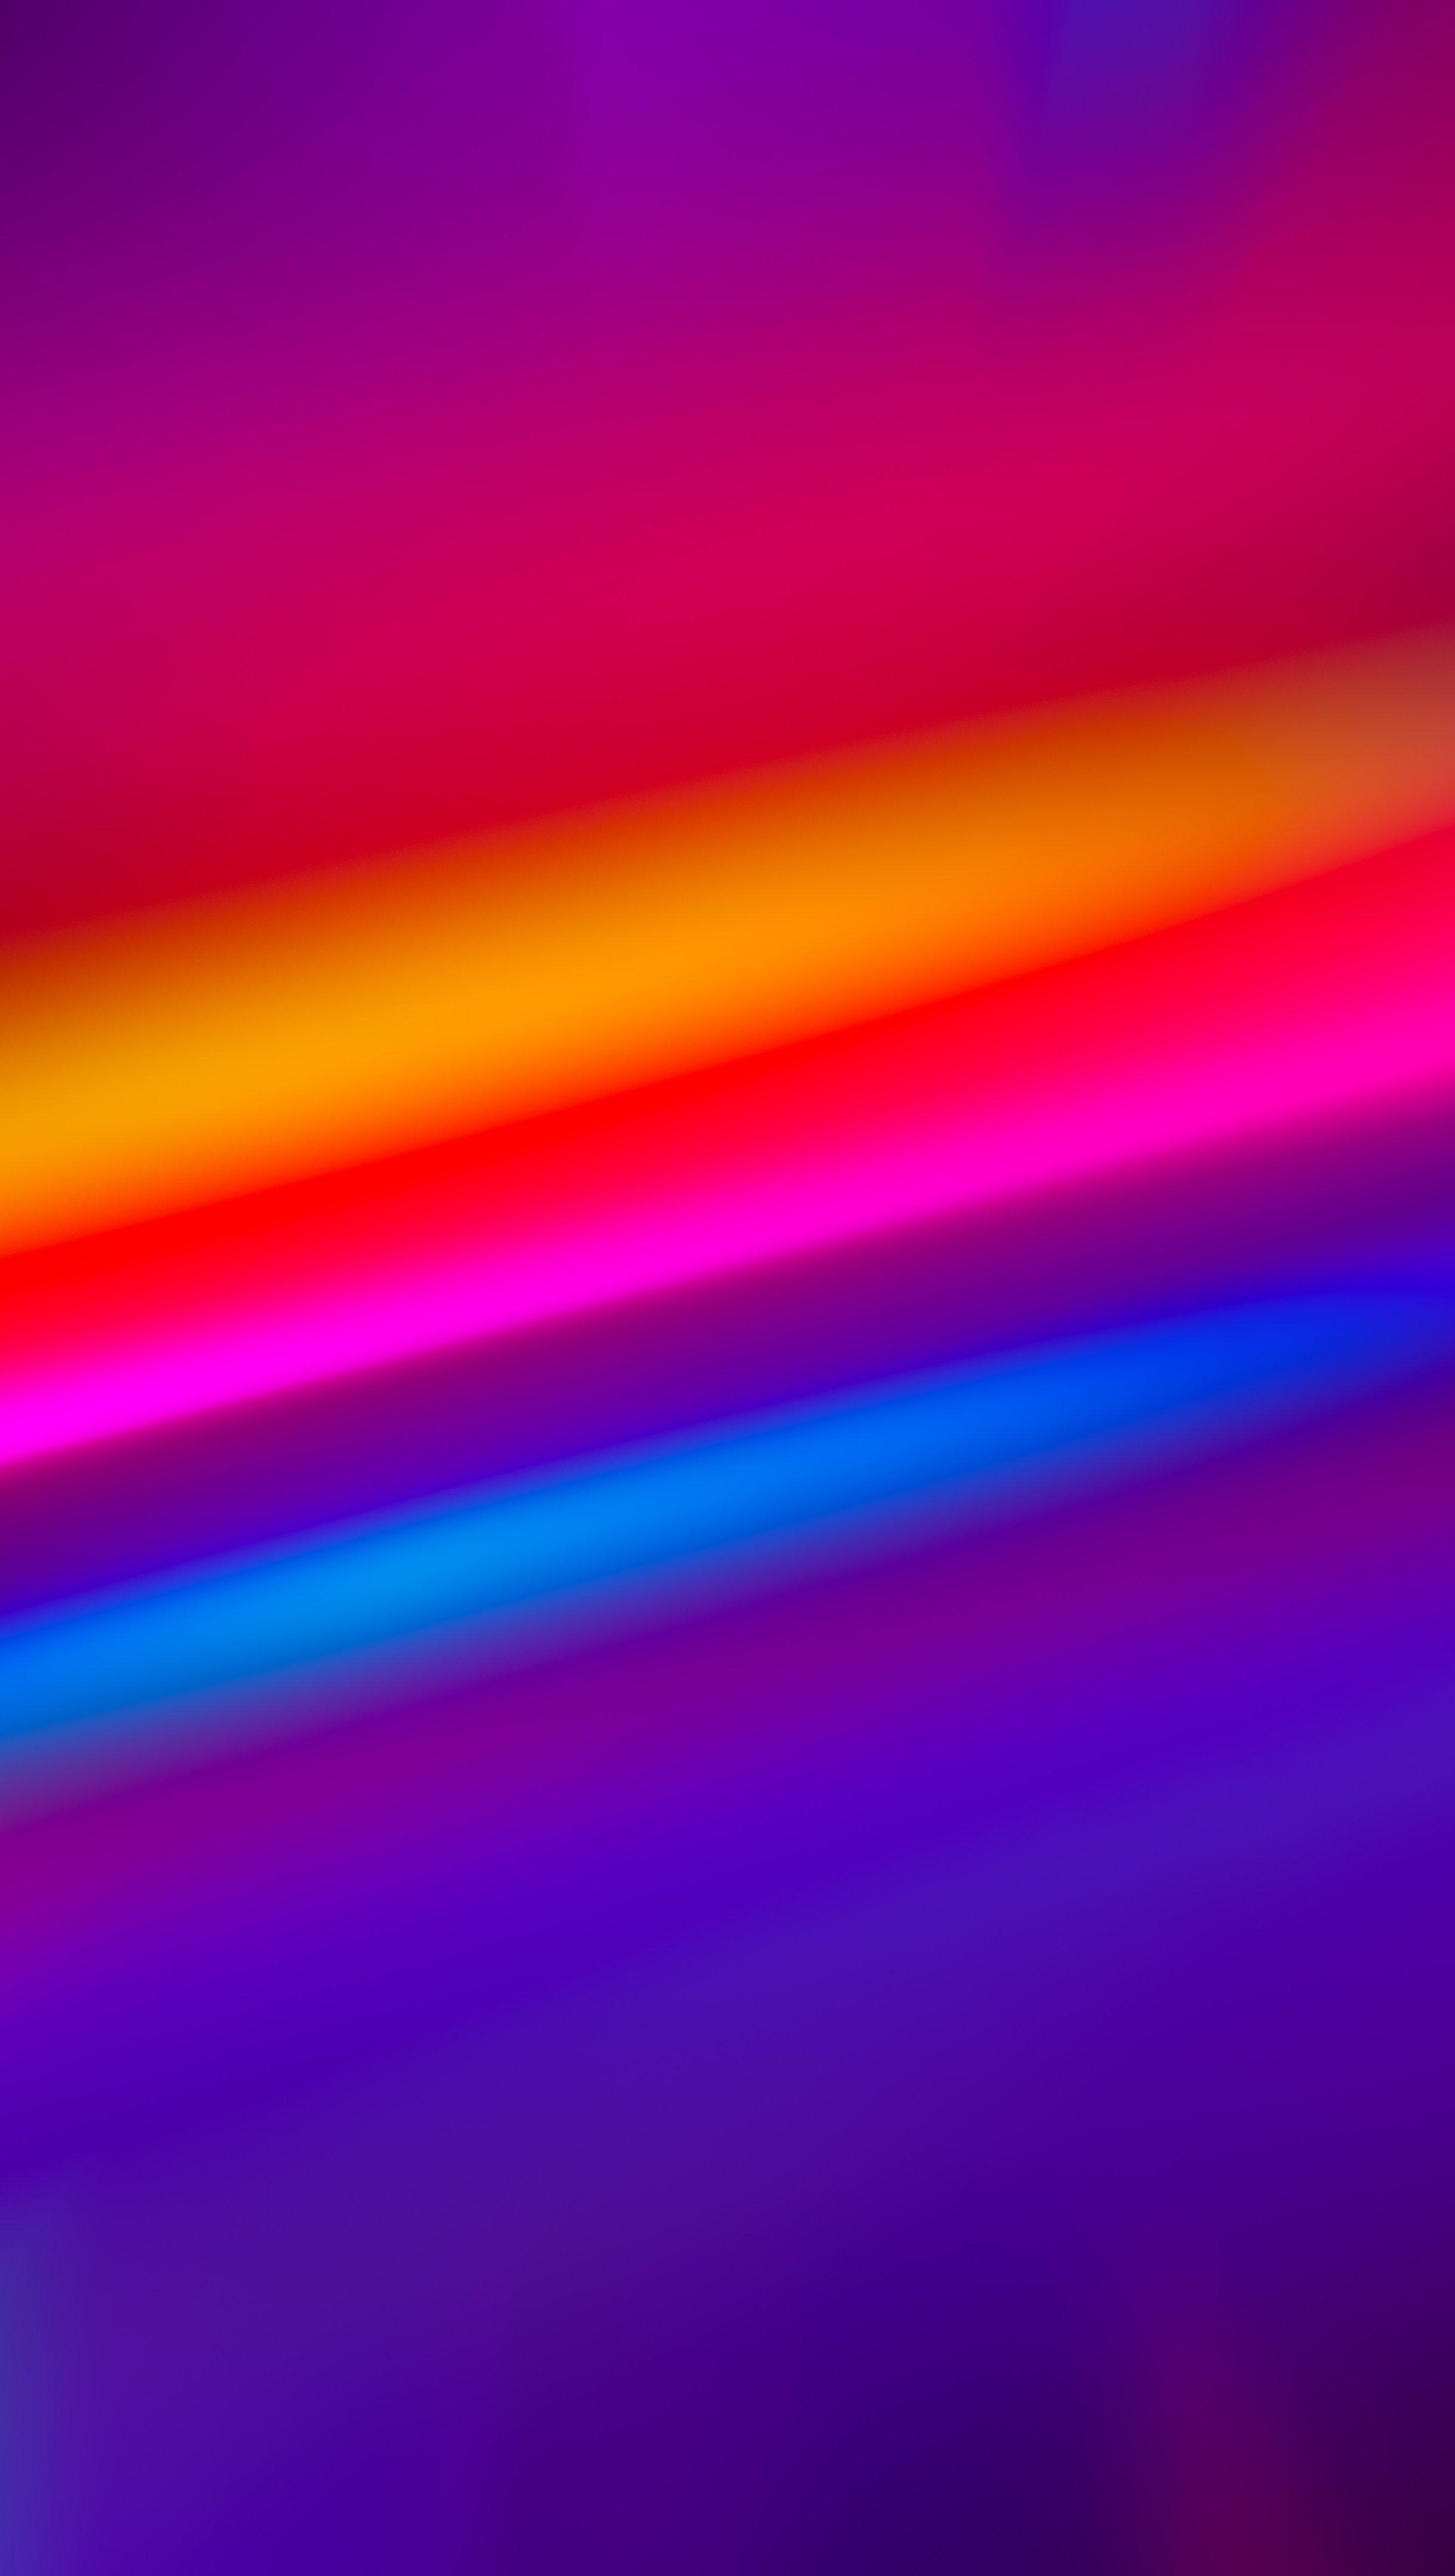 Fondos de pantalla Colores brillantes abstracto Vertical